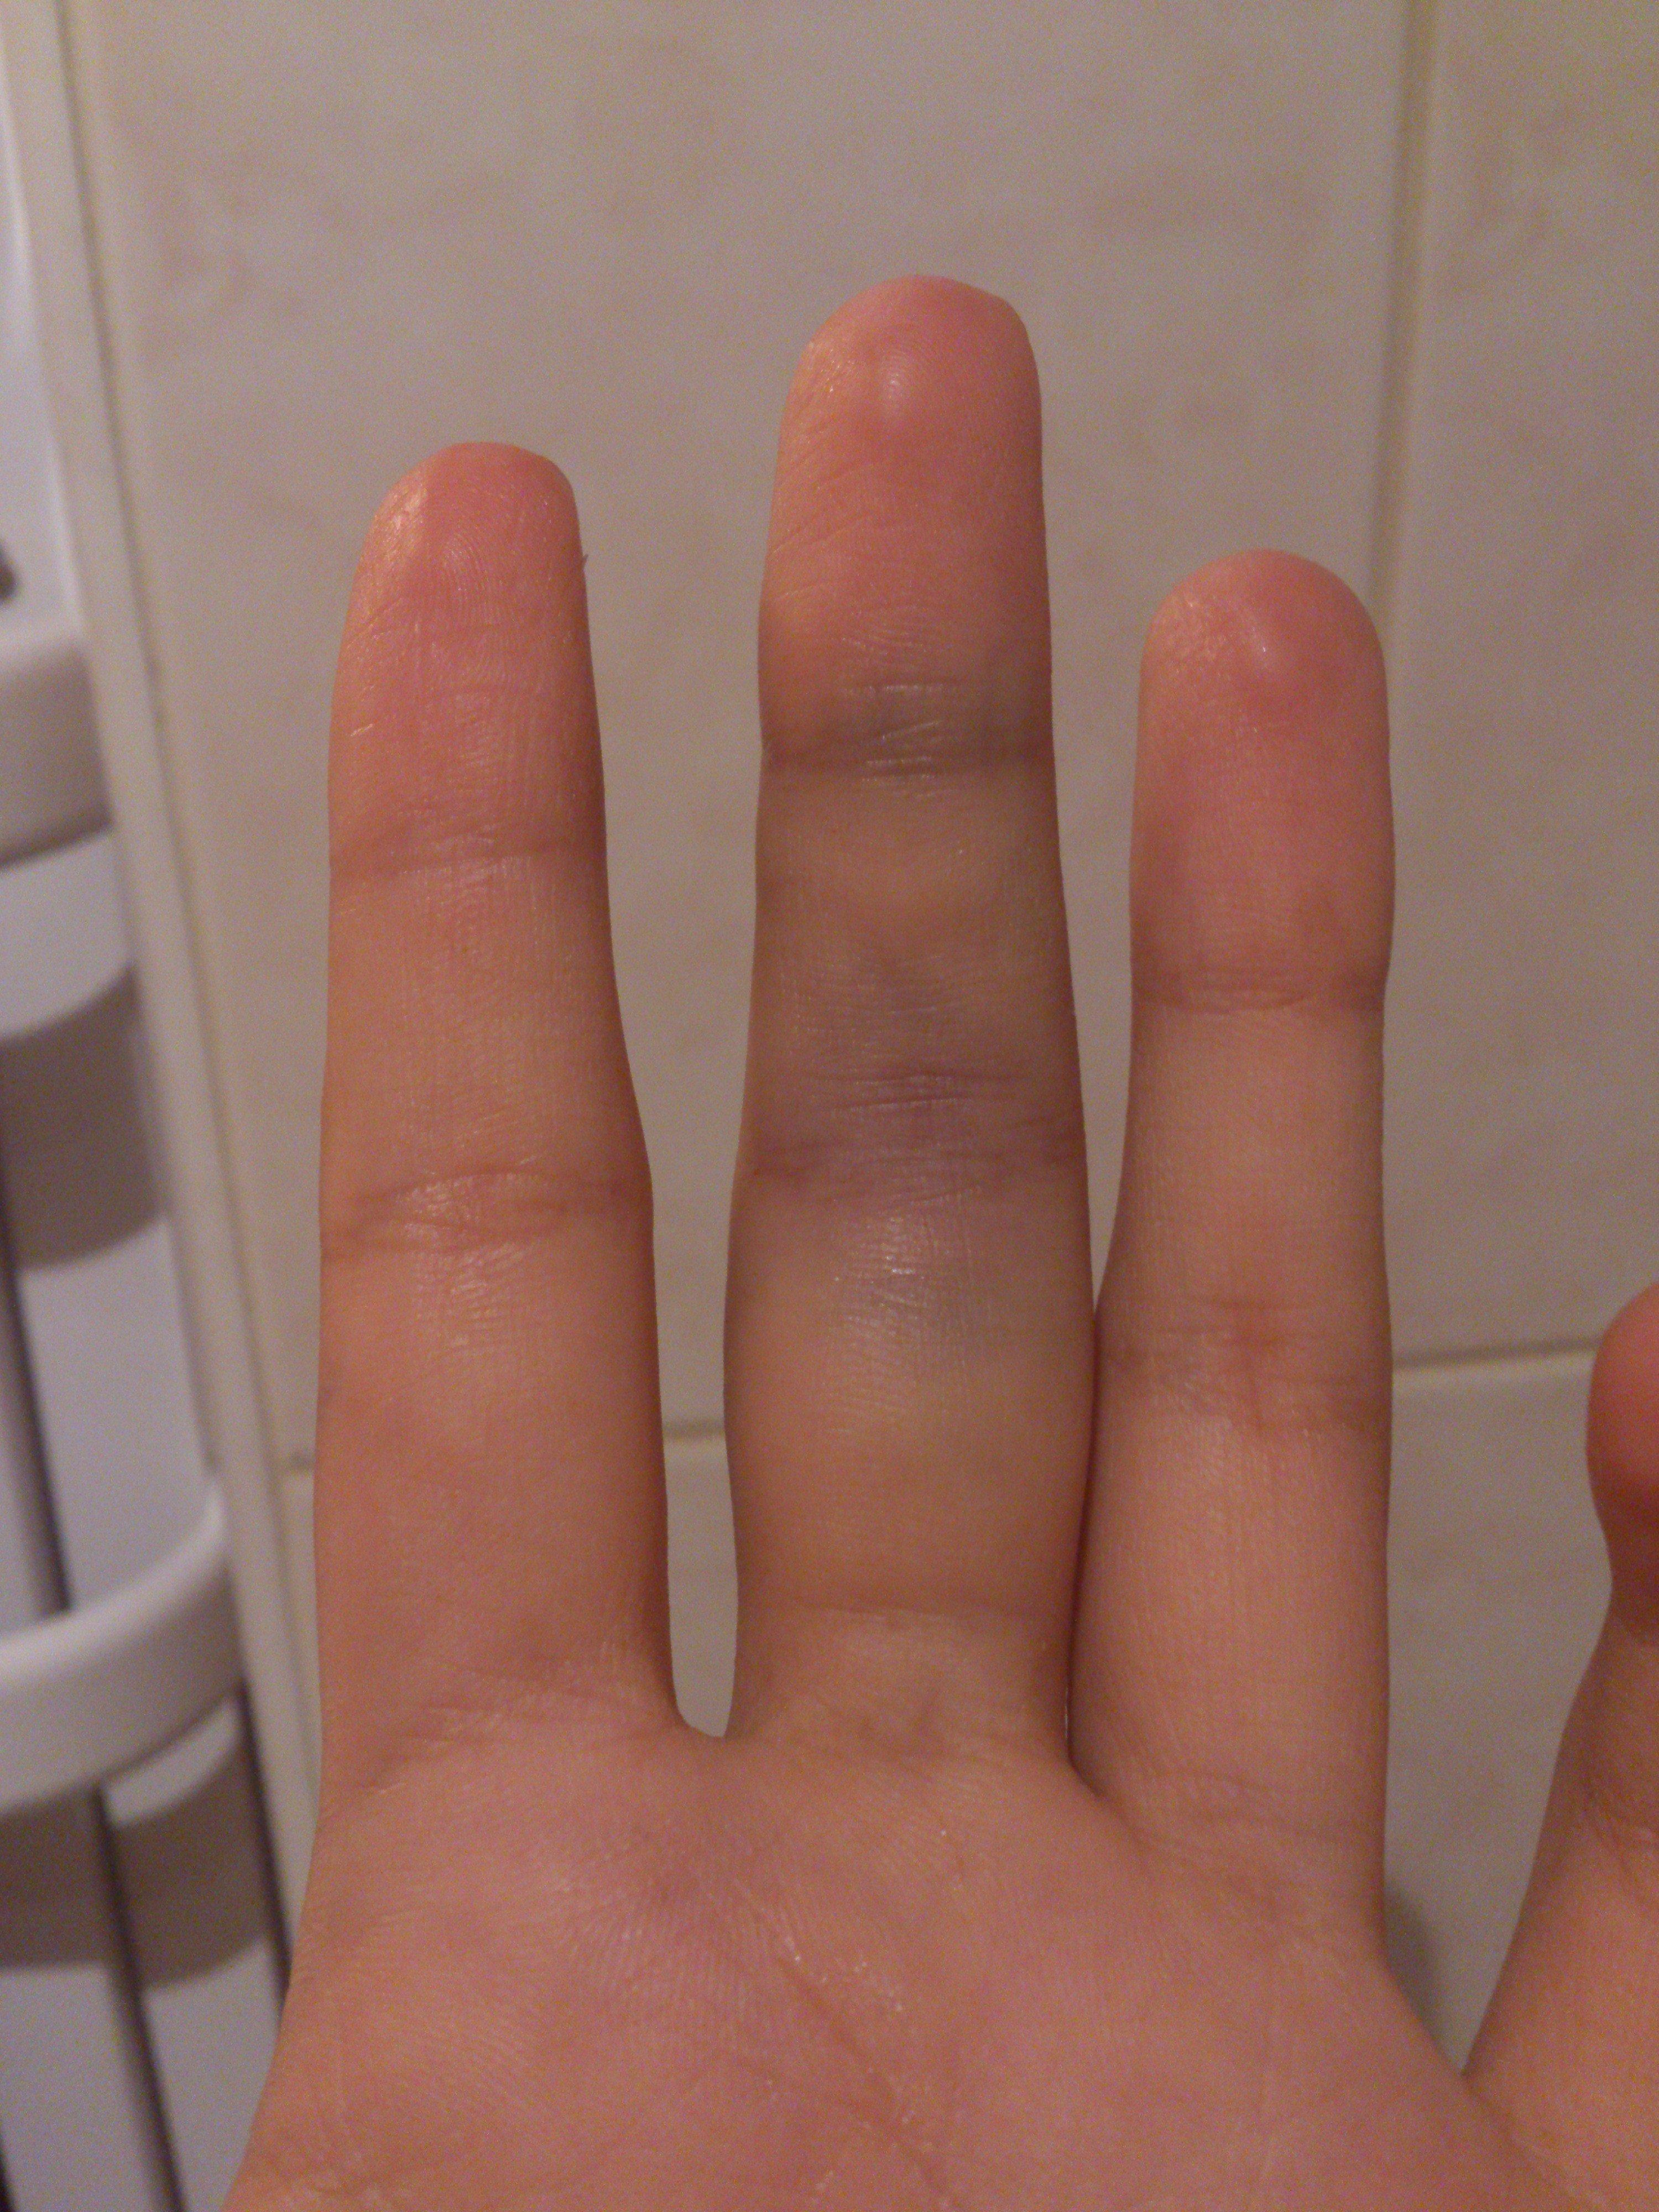 comment soigner foulure doigt